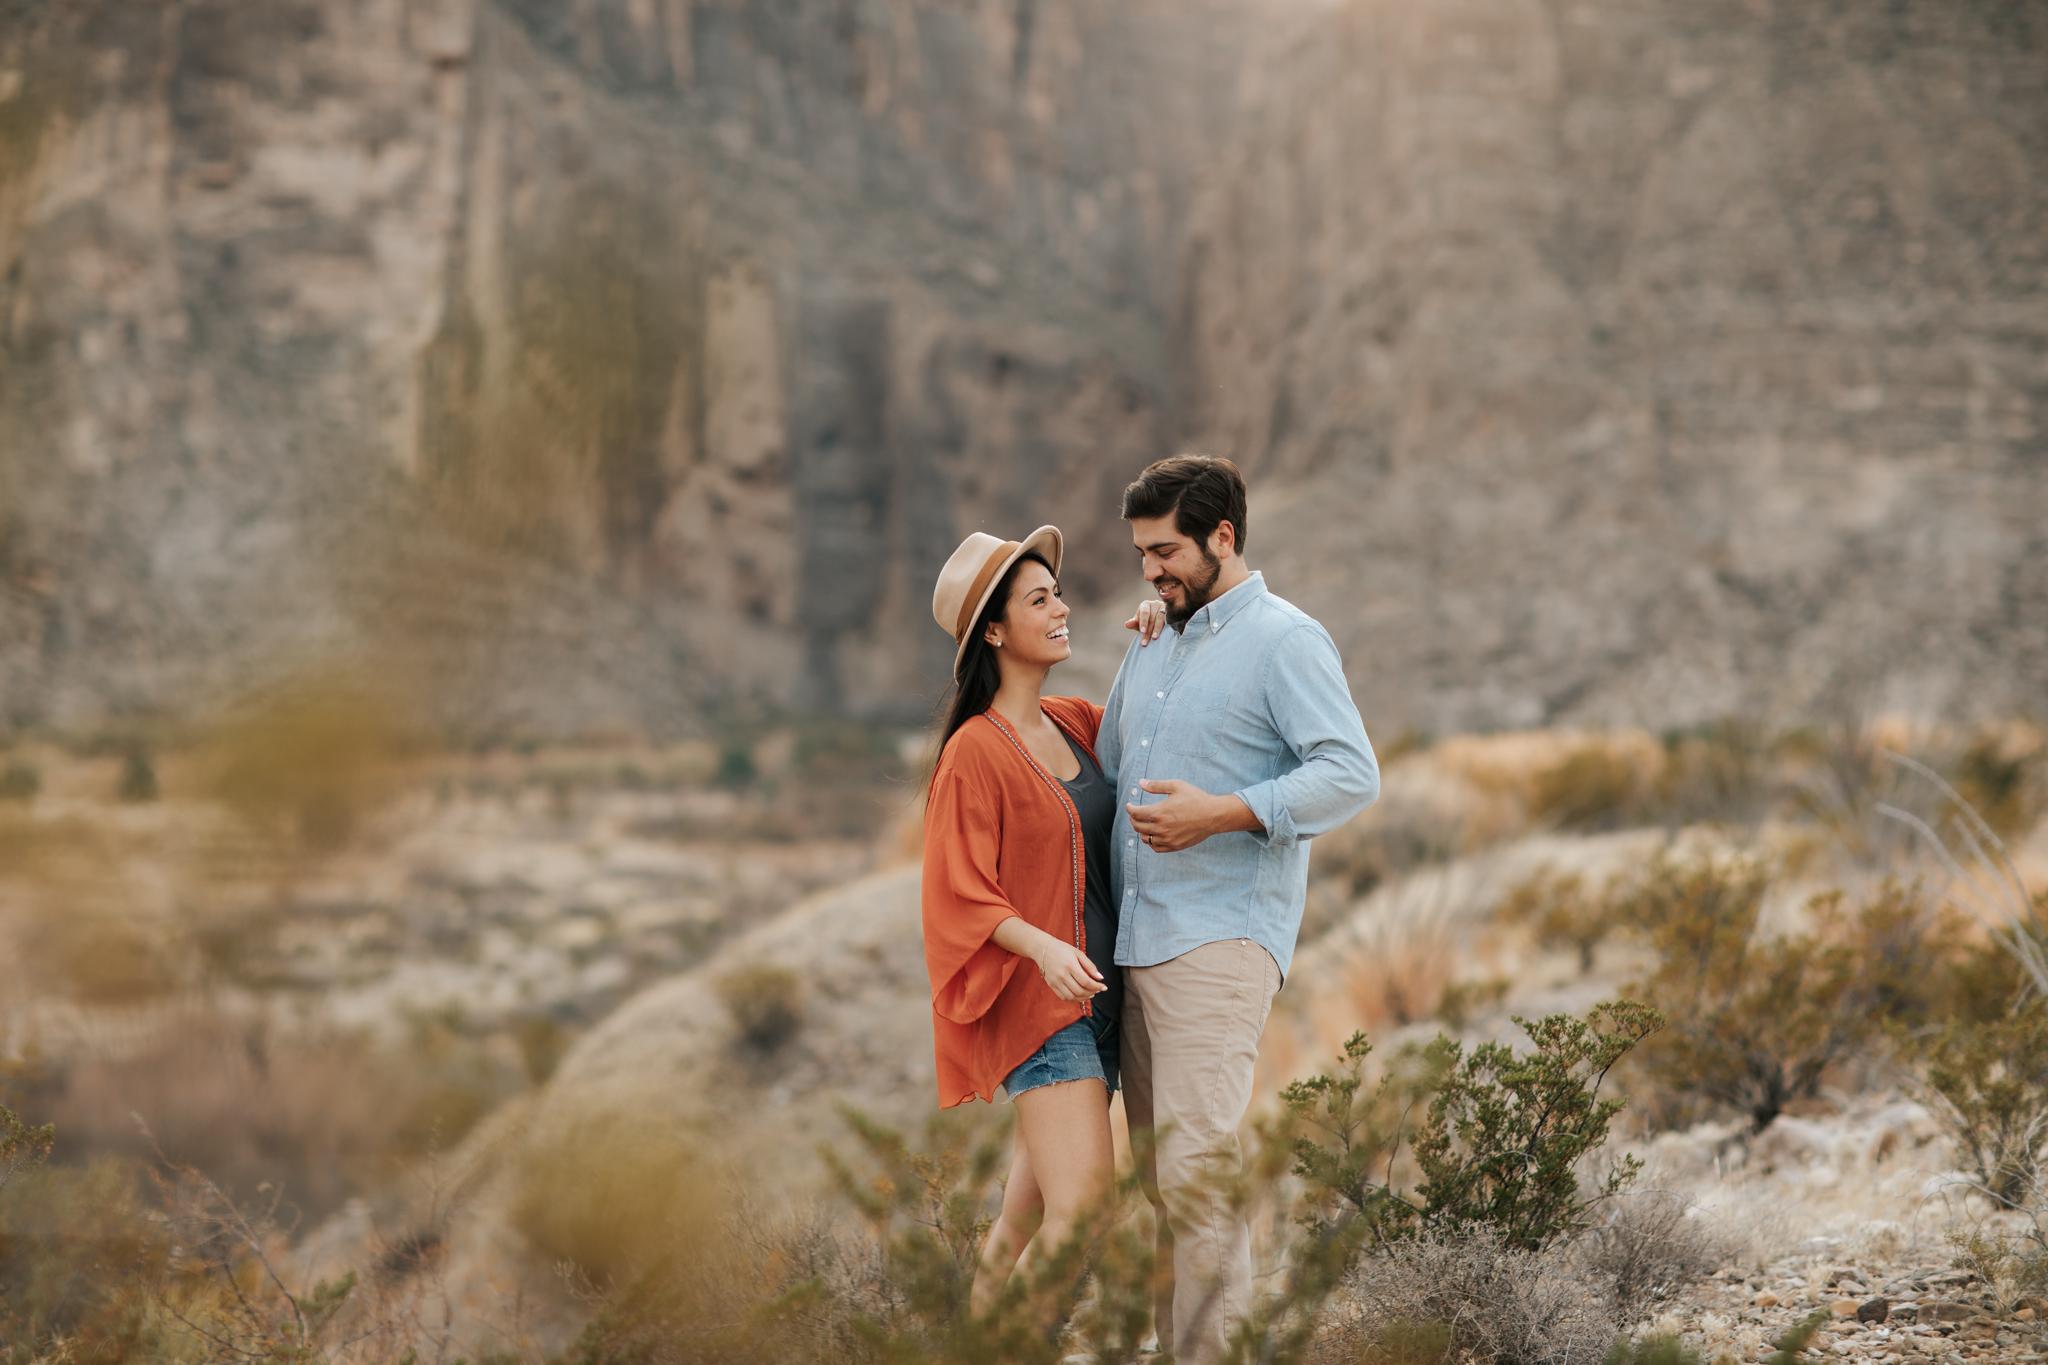 big-bend-elopement-intimate-adventure-wedding-texas-photographer-nature-colorado-83.jpg